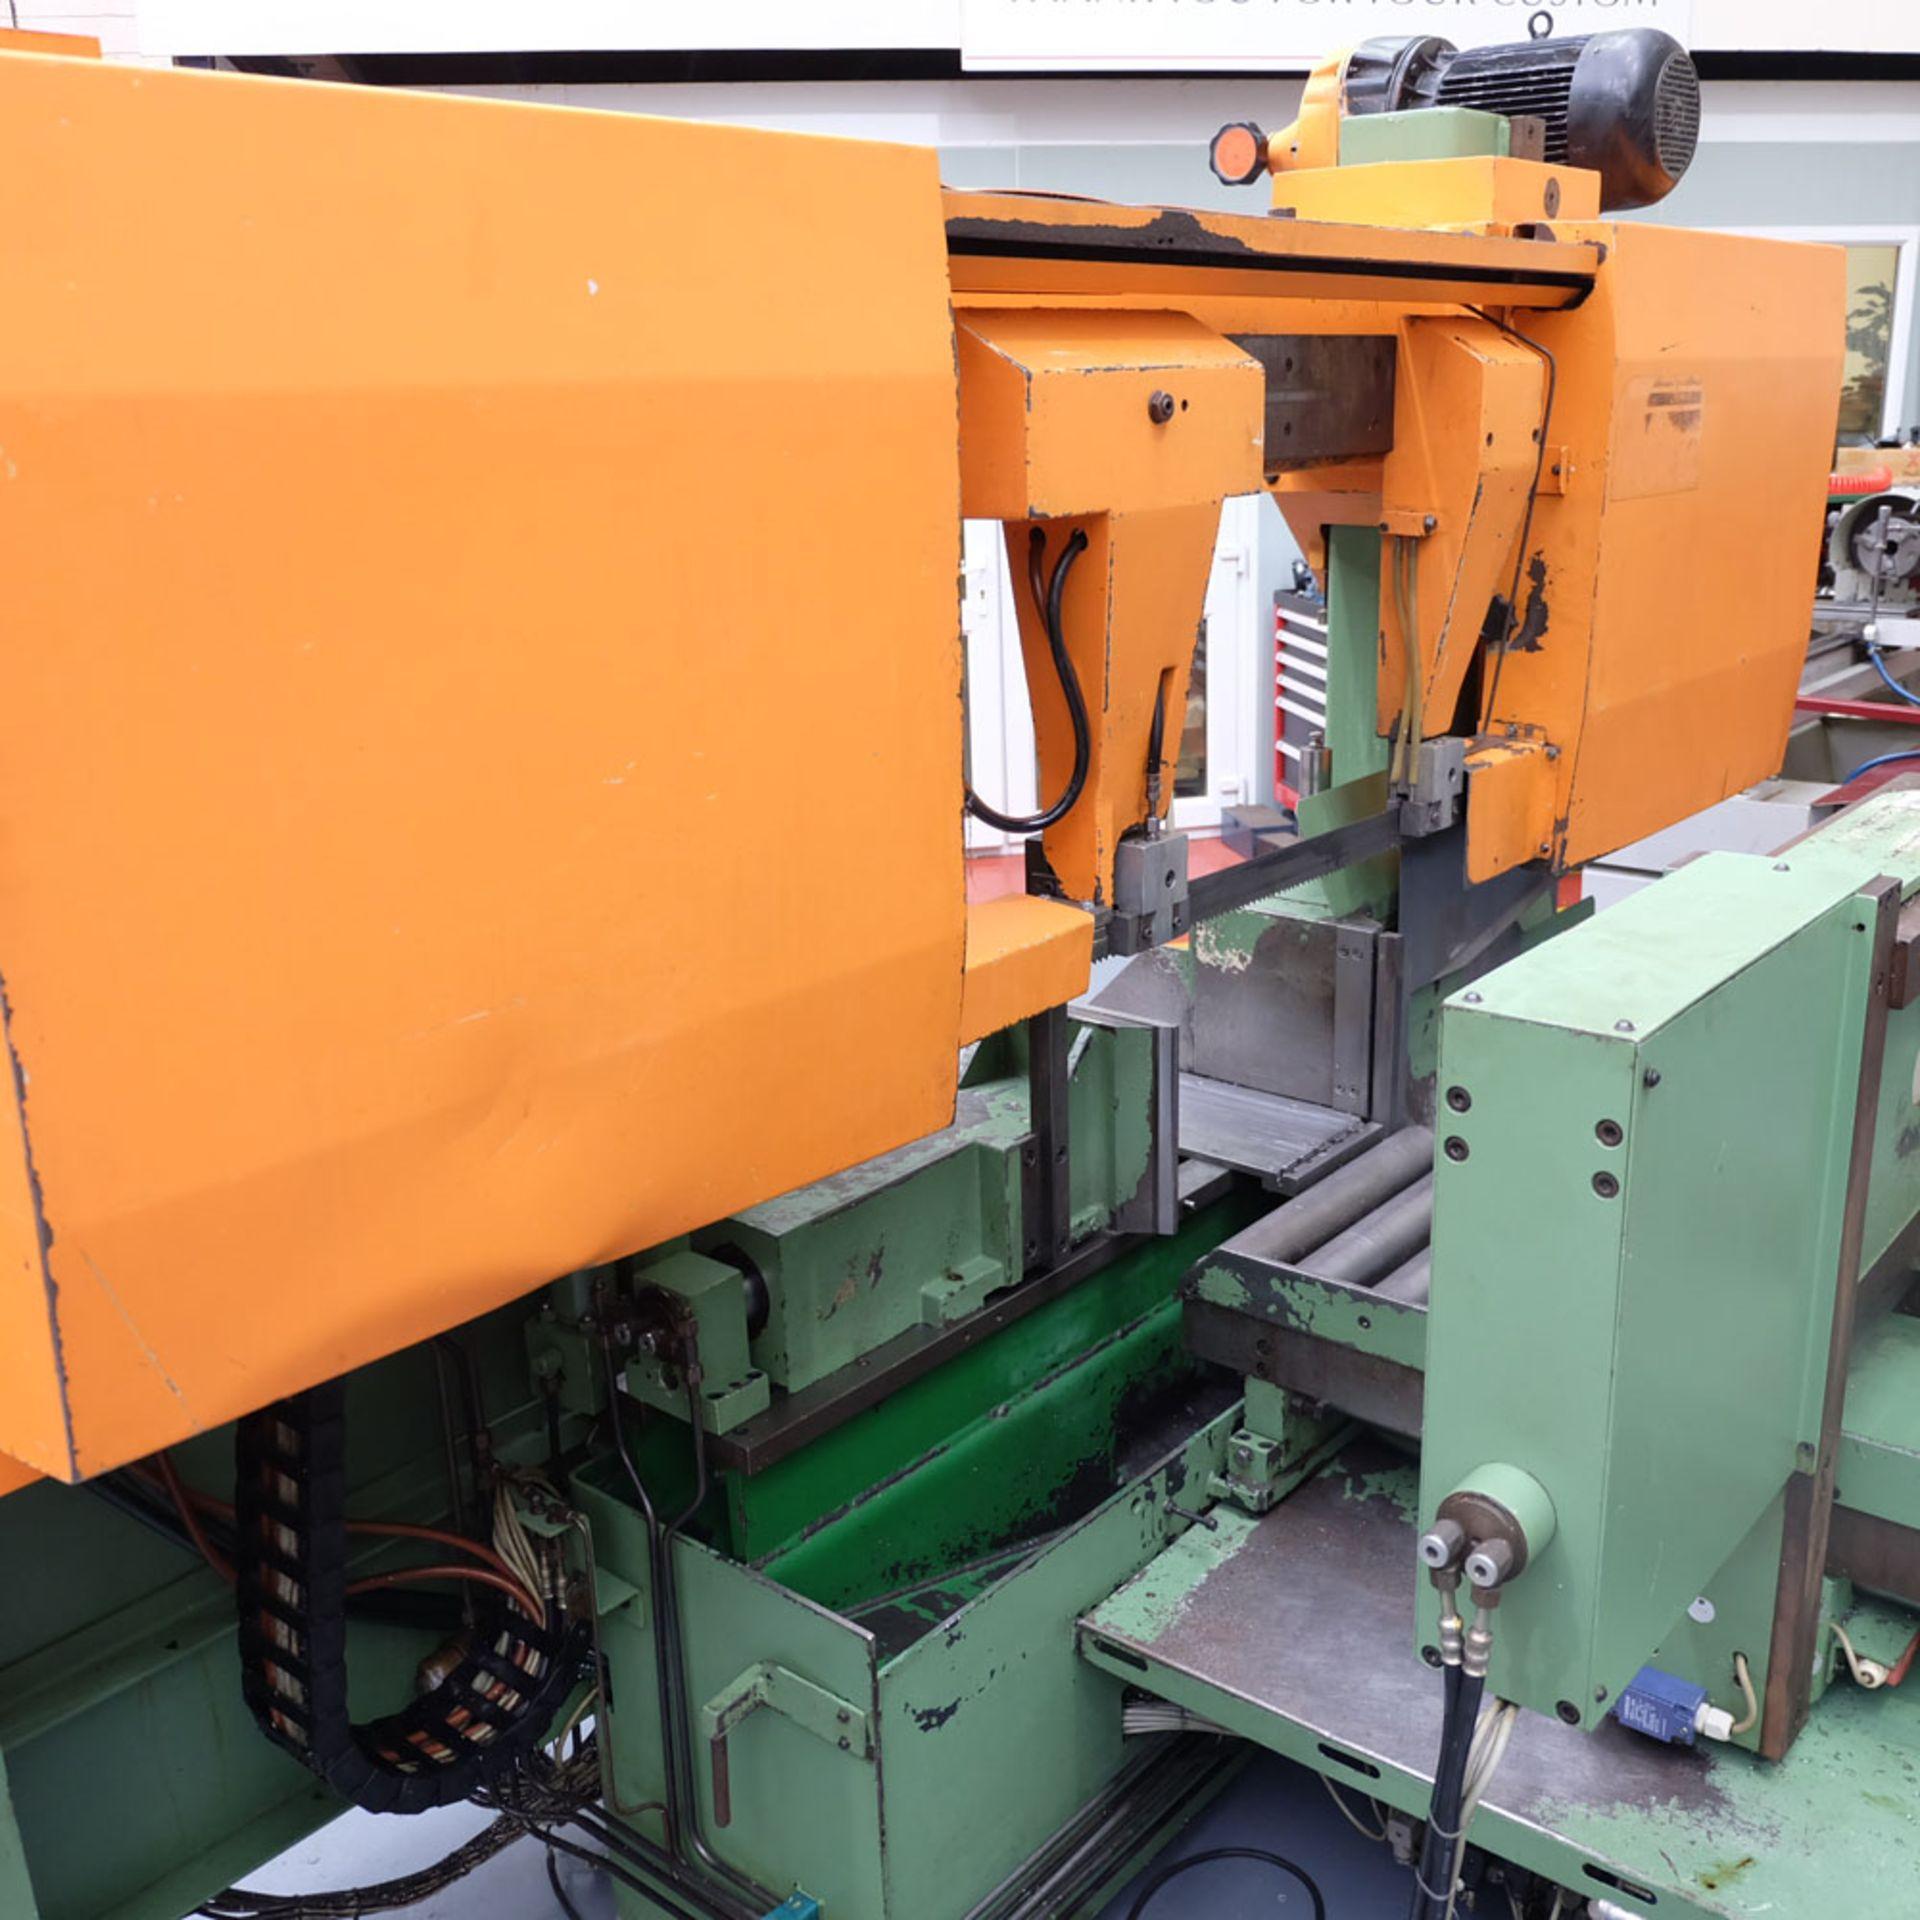 Kasto HBA 420 AU Heavy Duty Automatic Horizontal Band Sawing Machine. - Image 7 of 7